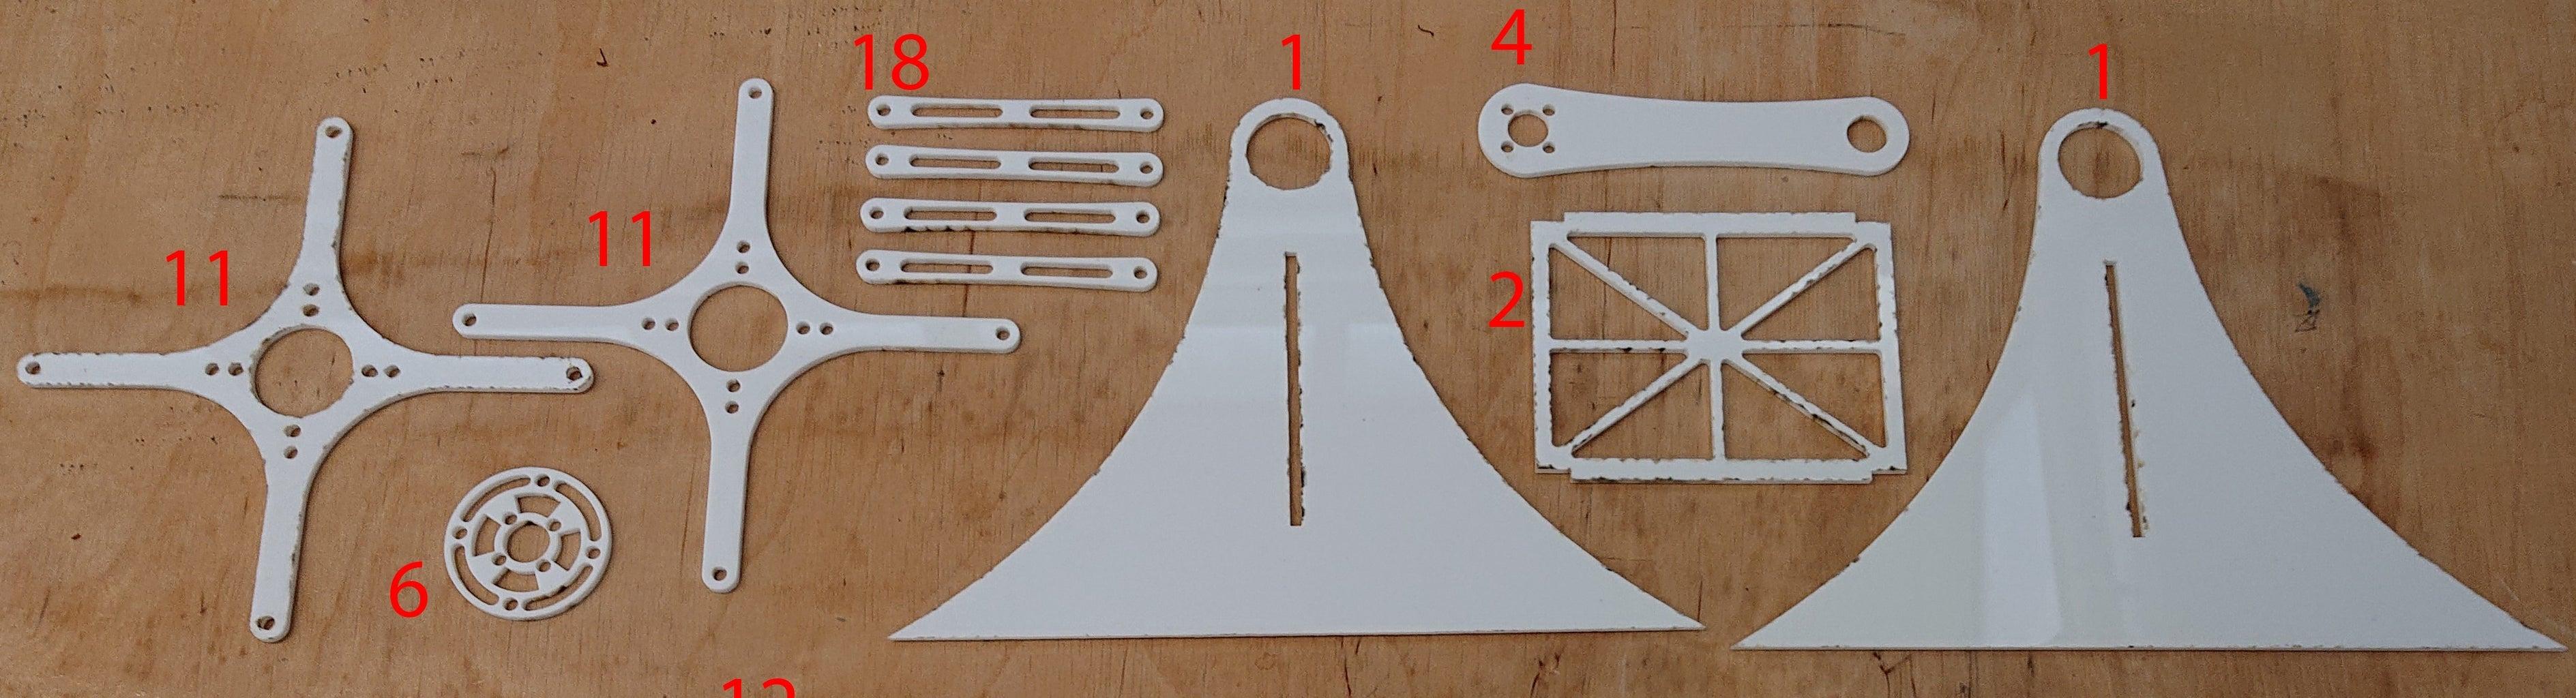 Materials 3mm Laser Cutting